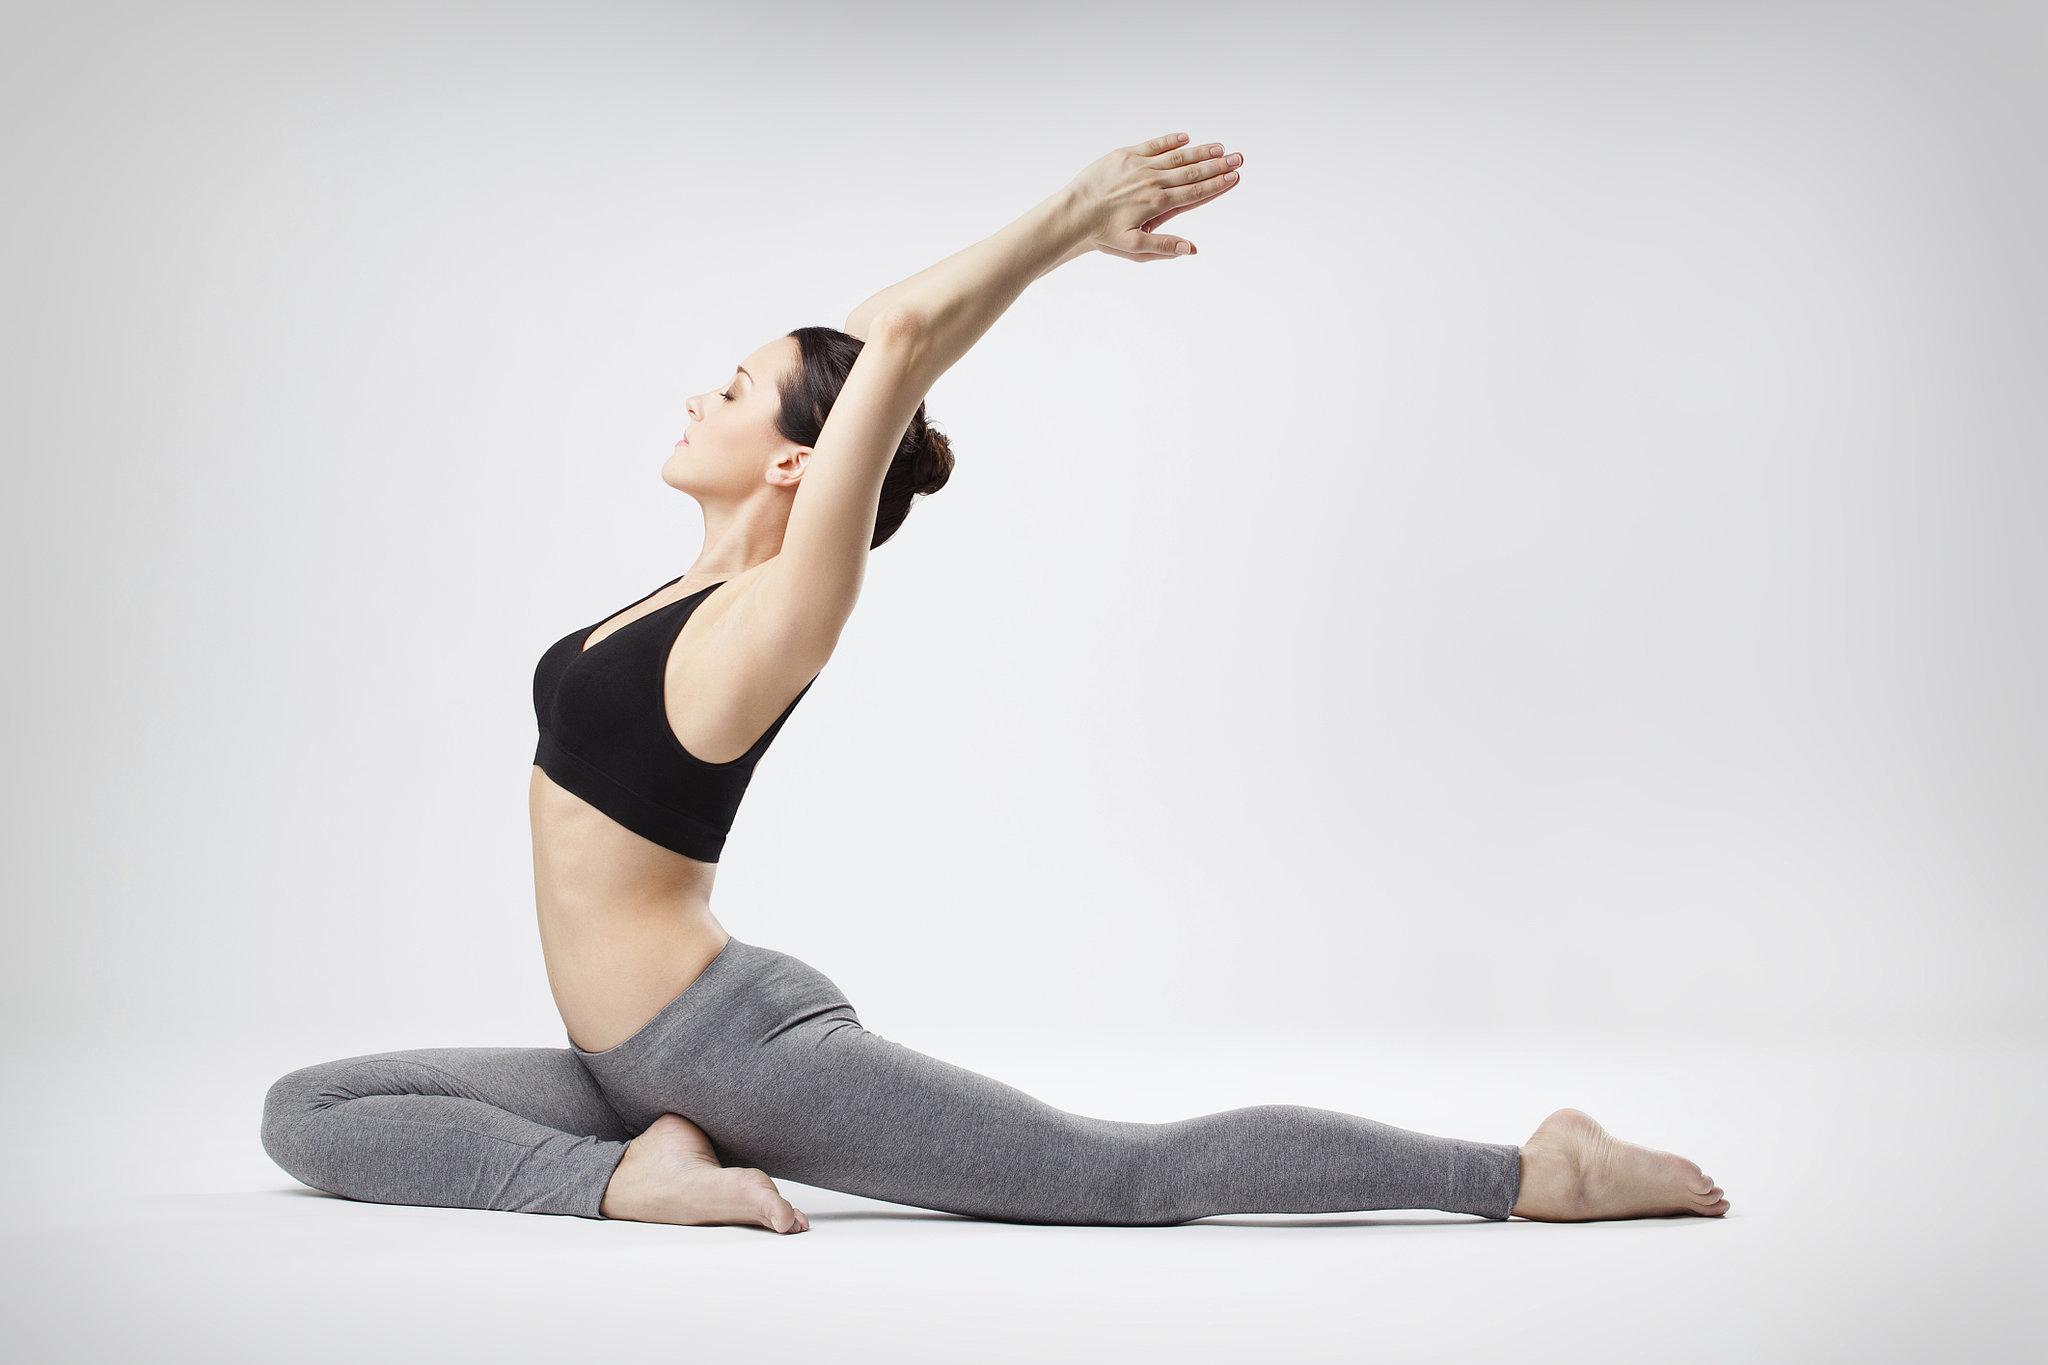 Come-on-yoga (Йога студия) image